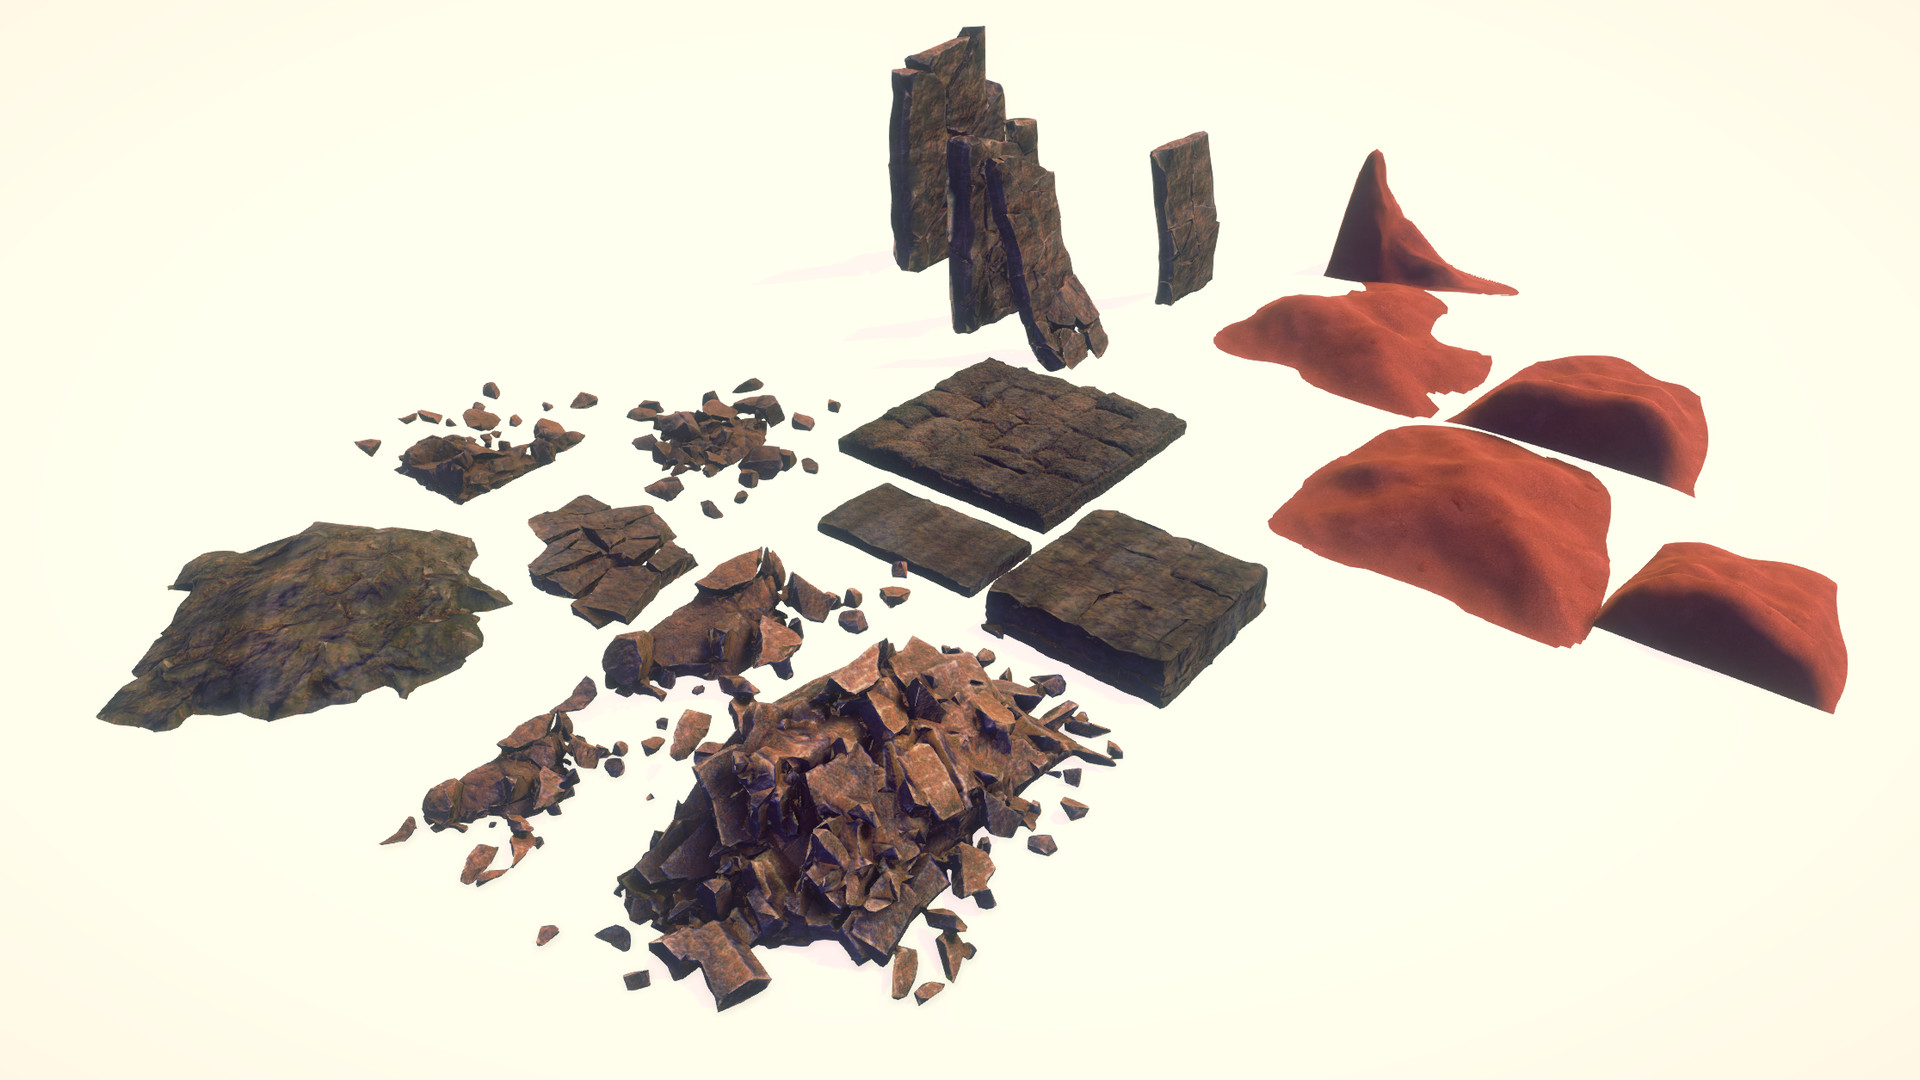 Rubble, stone chunks, sand.